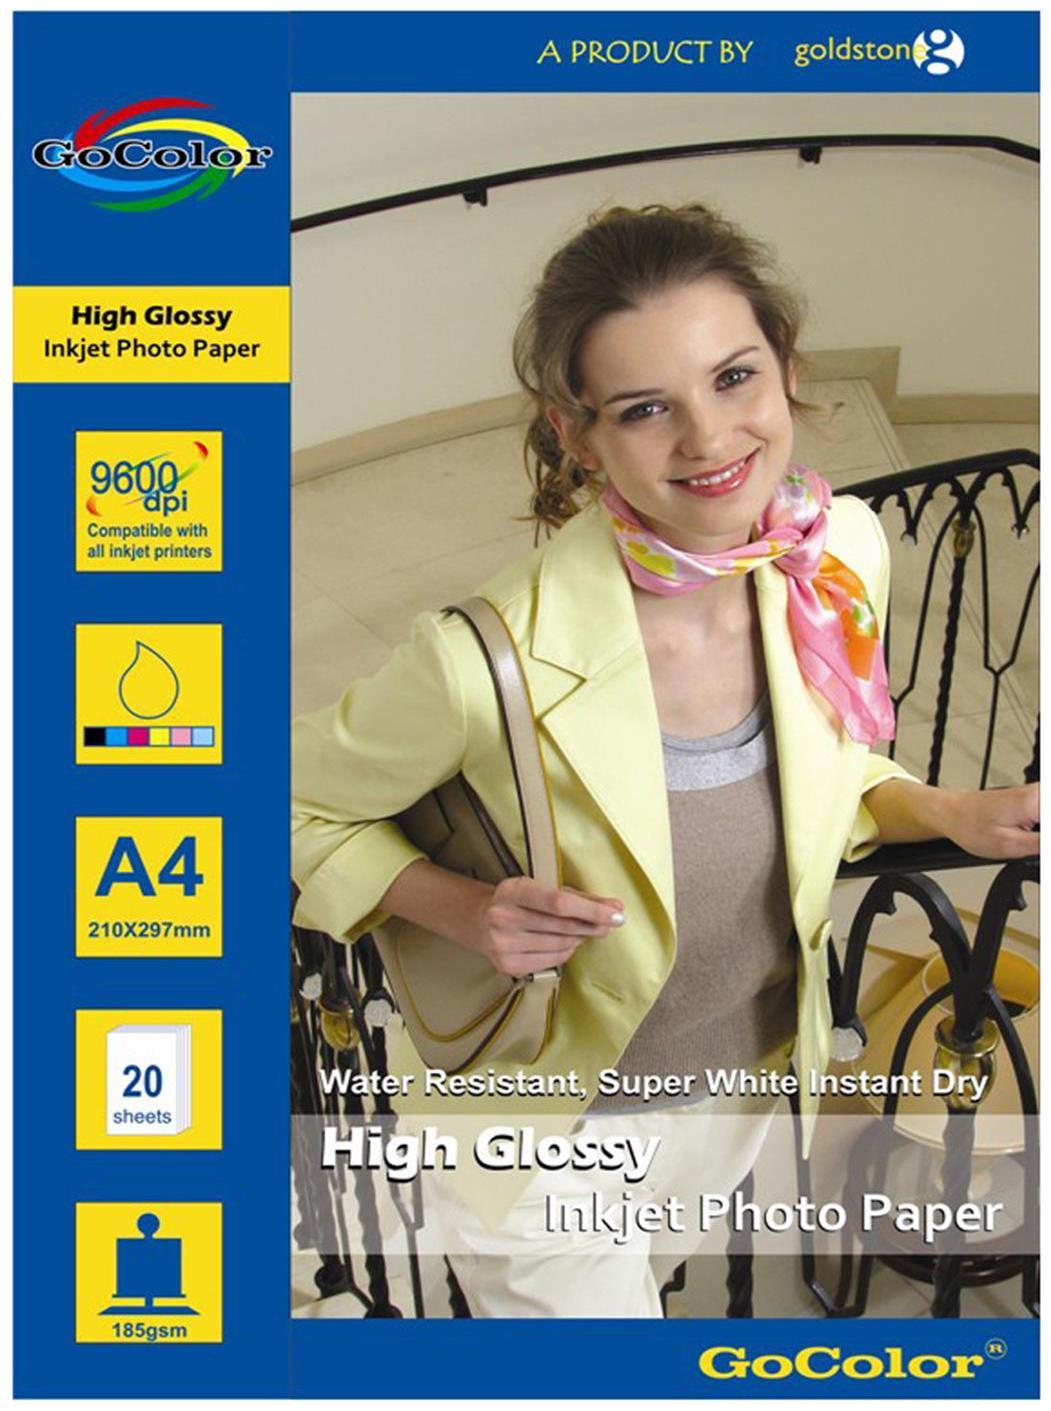 GoColor High Glossy Inkjet Photo Paper 185 GSM 20 Sheets A4 Size